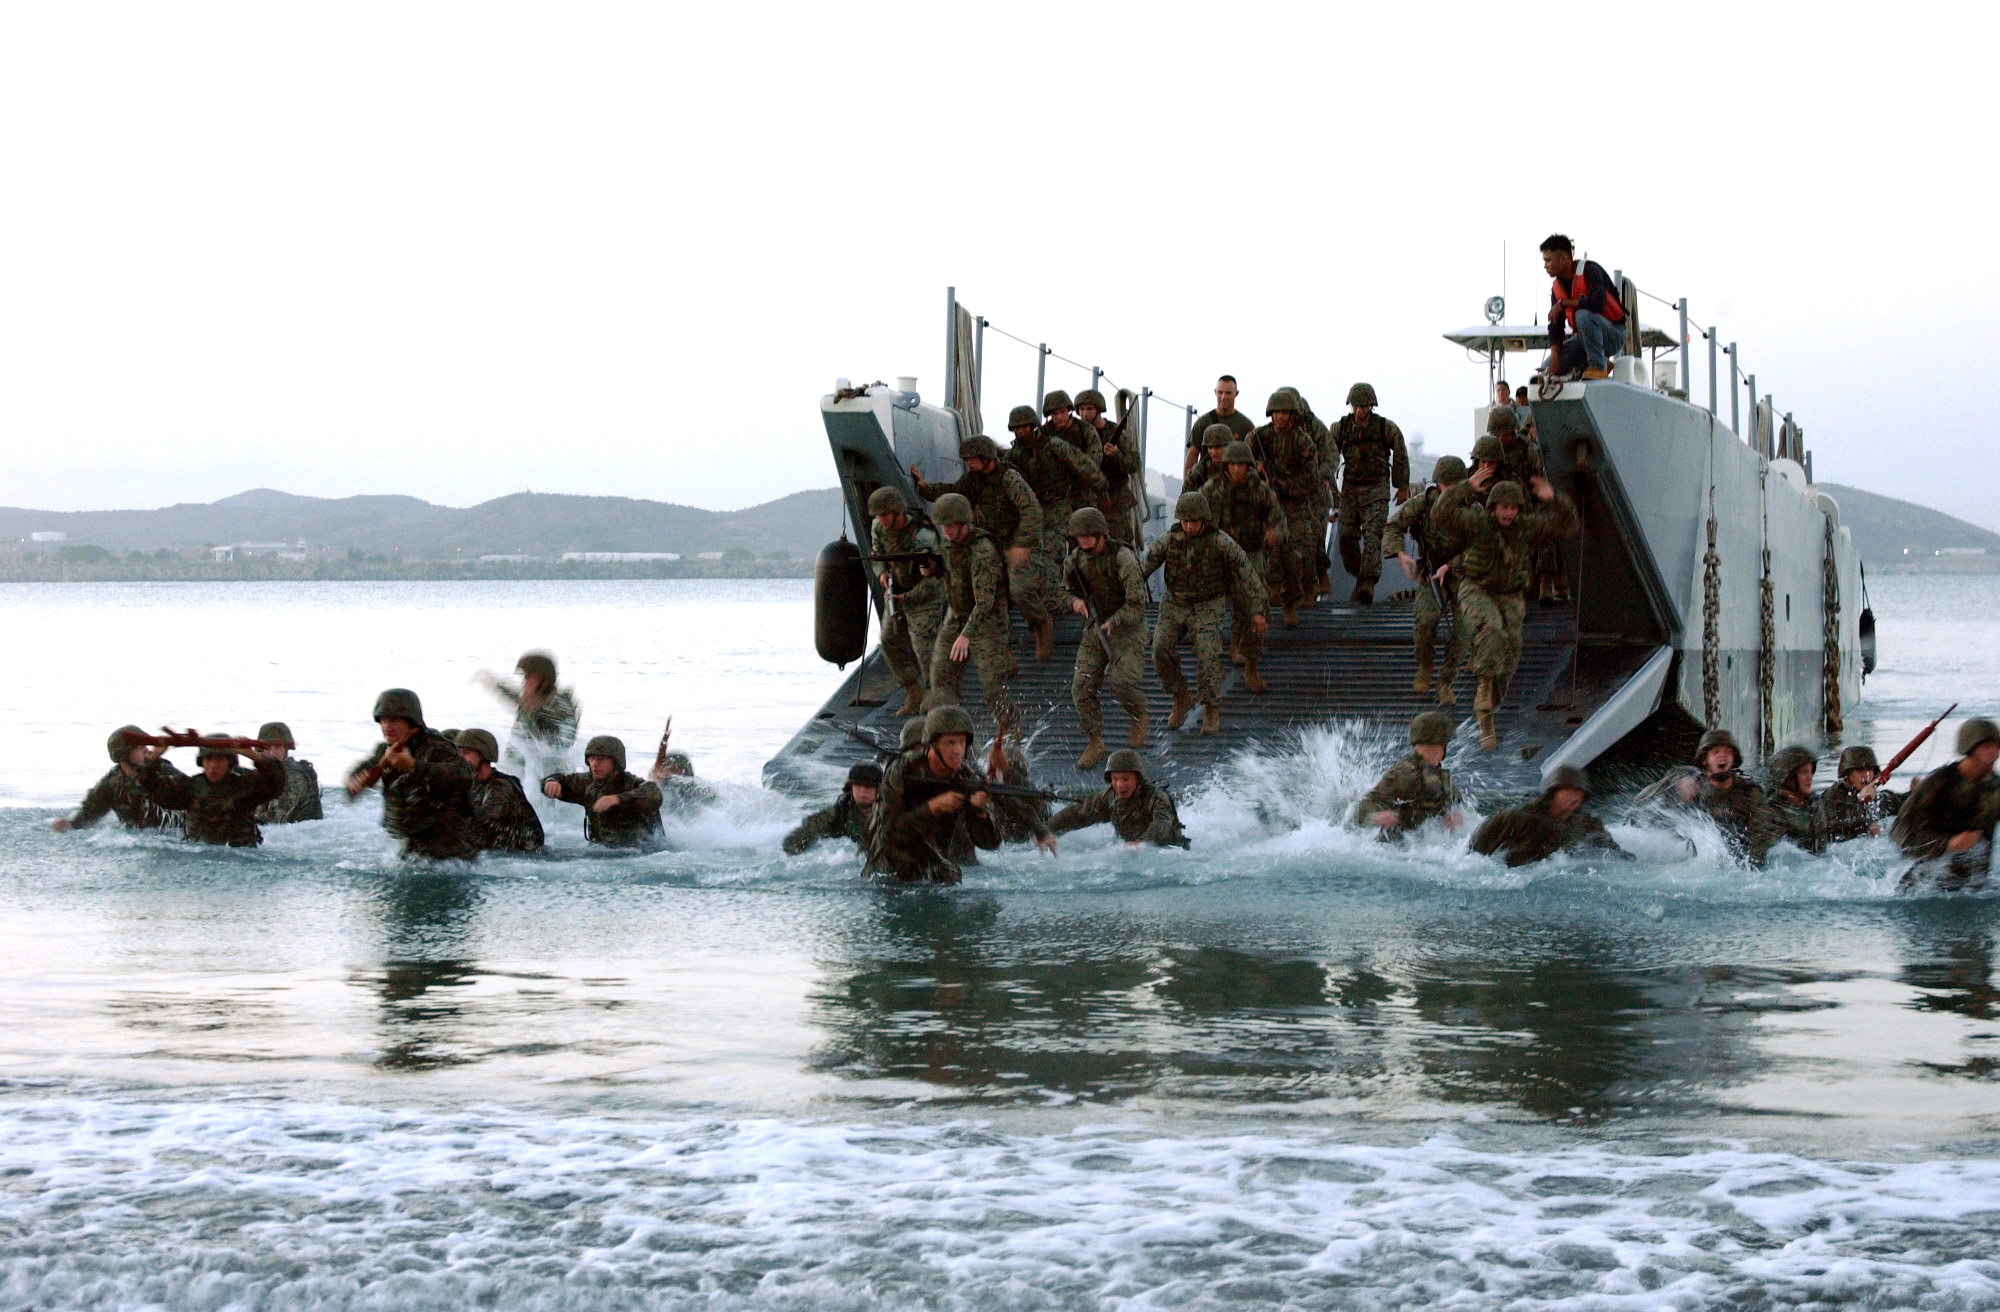 Amphibious_assault%2C_Landing_Craft_Utility_%28LCU%29%2C_23June04.jpg